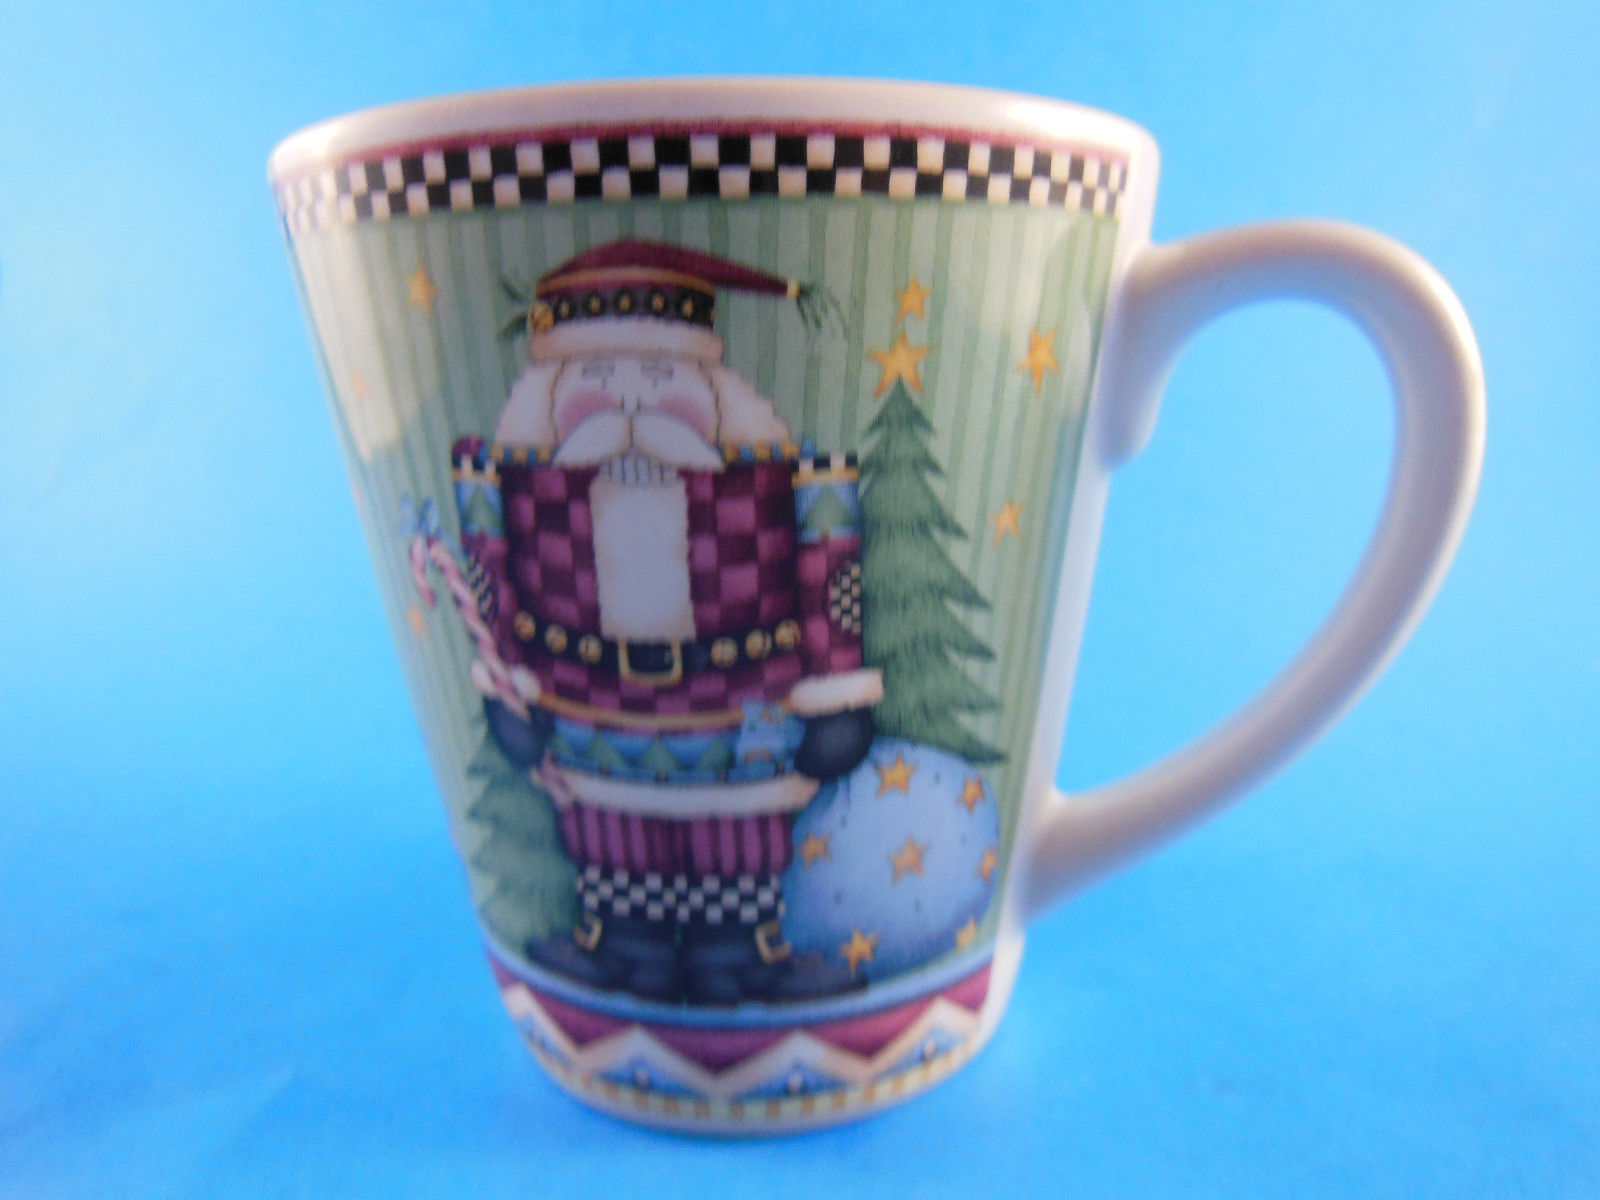 Nutcrackers Sakura Mug Cup Oneida Casual and 24 similar items